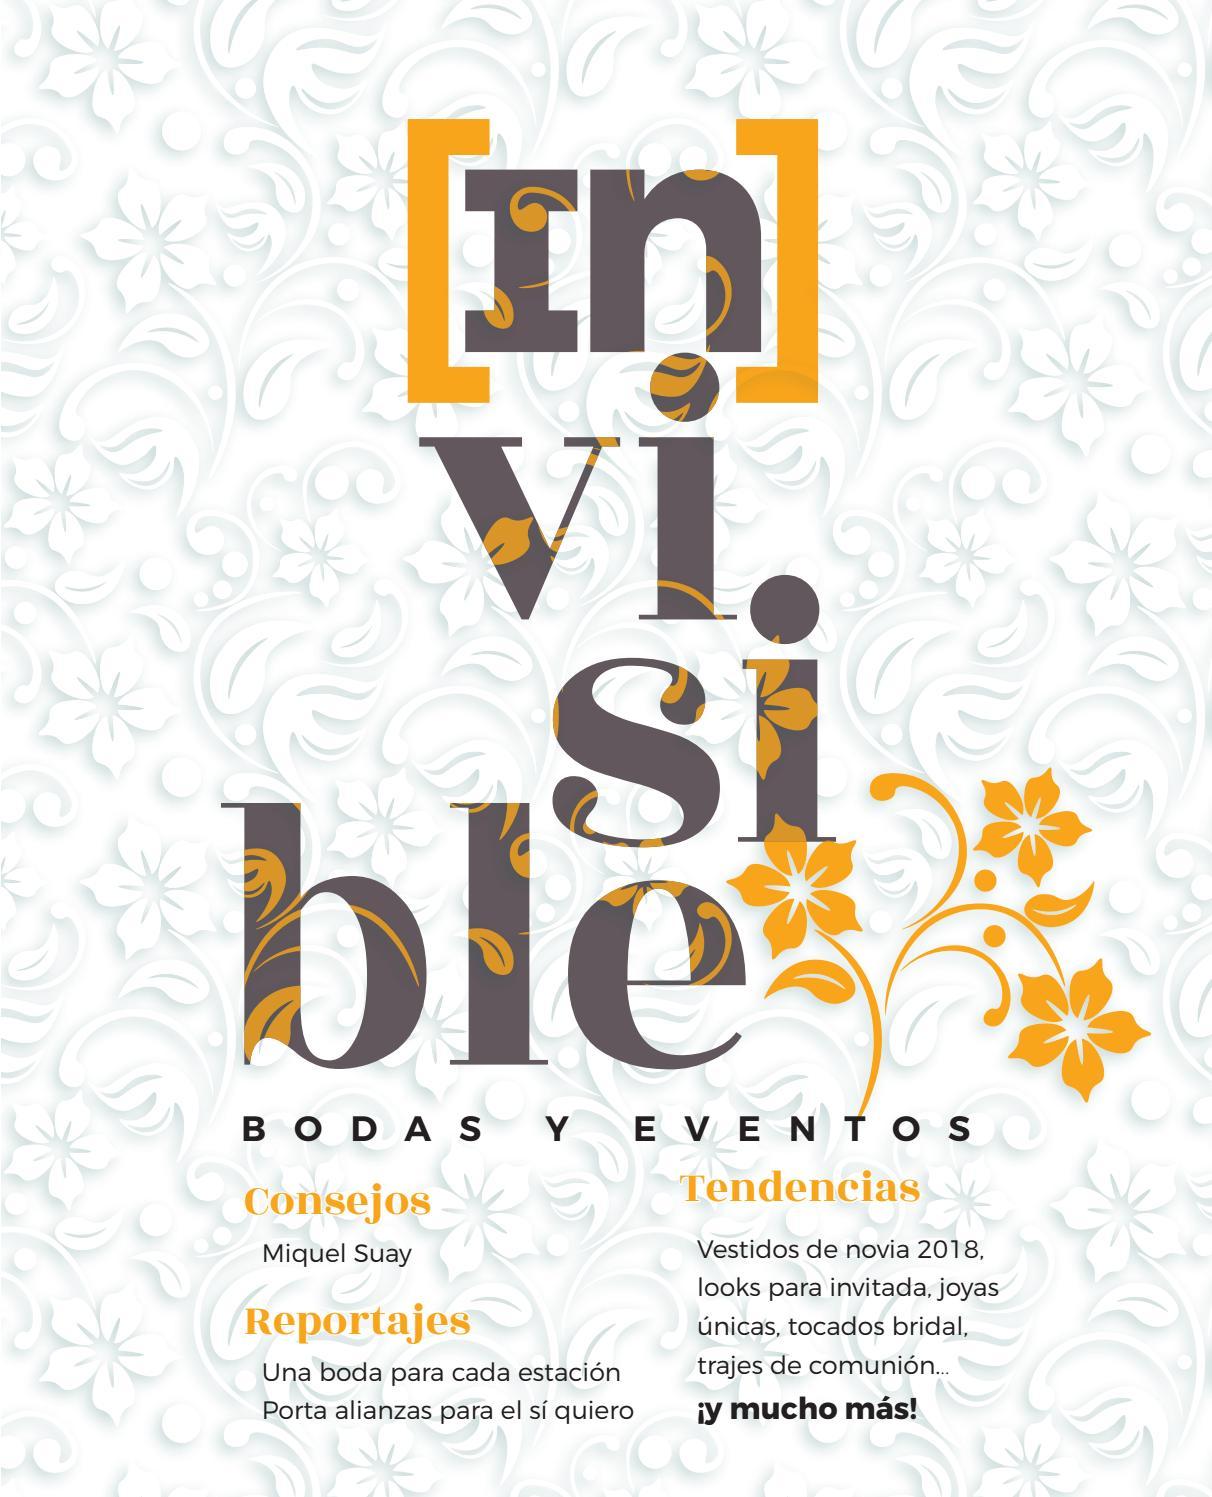 24bd09bb Invisible Bodas y Eventos 2017/2018 by Safor Guia - issuu